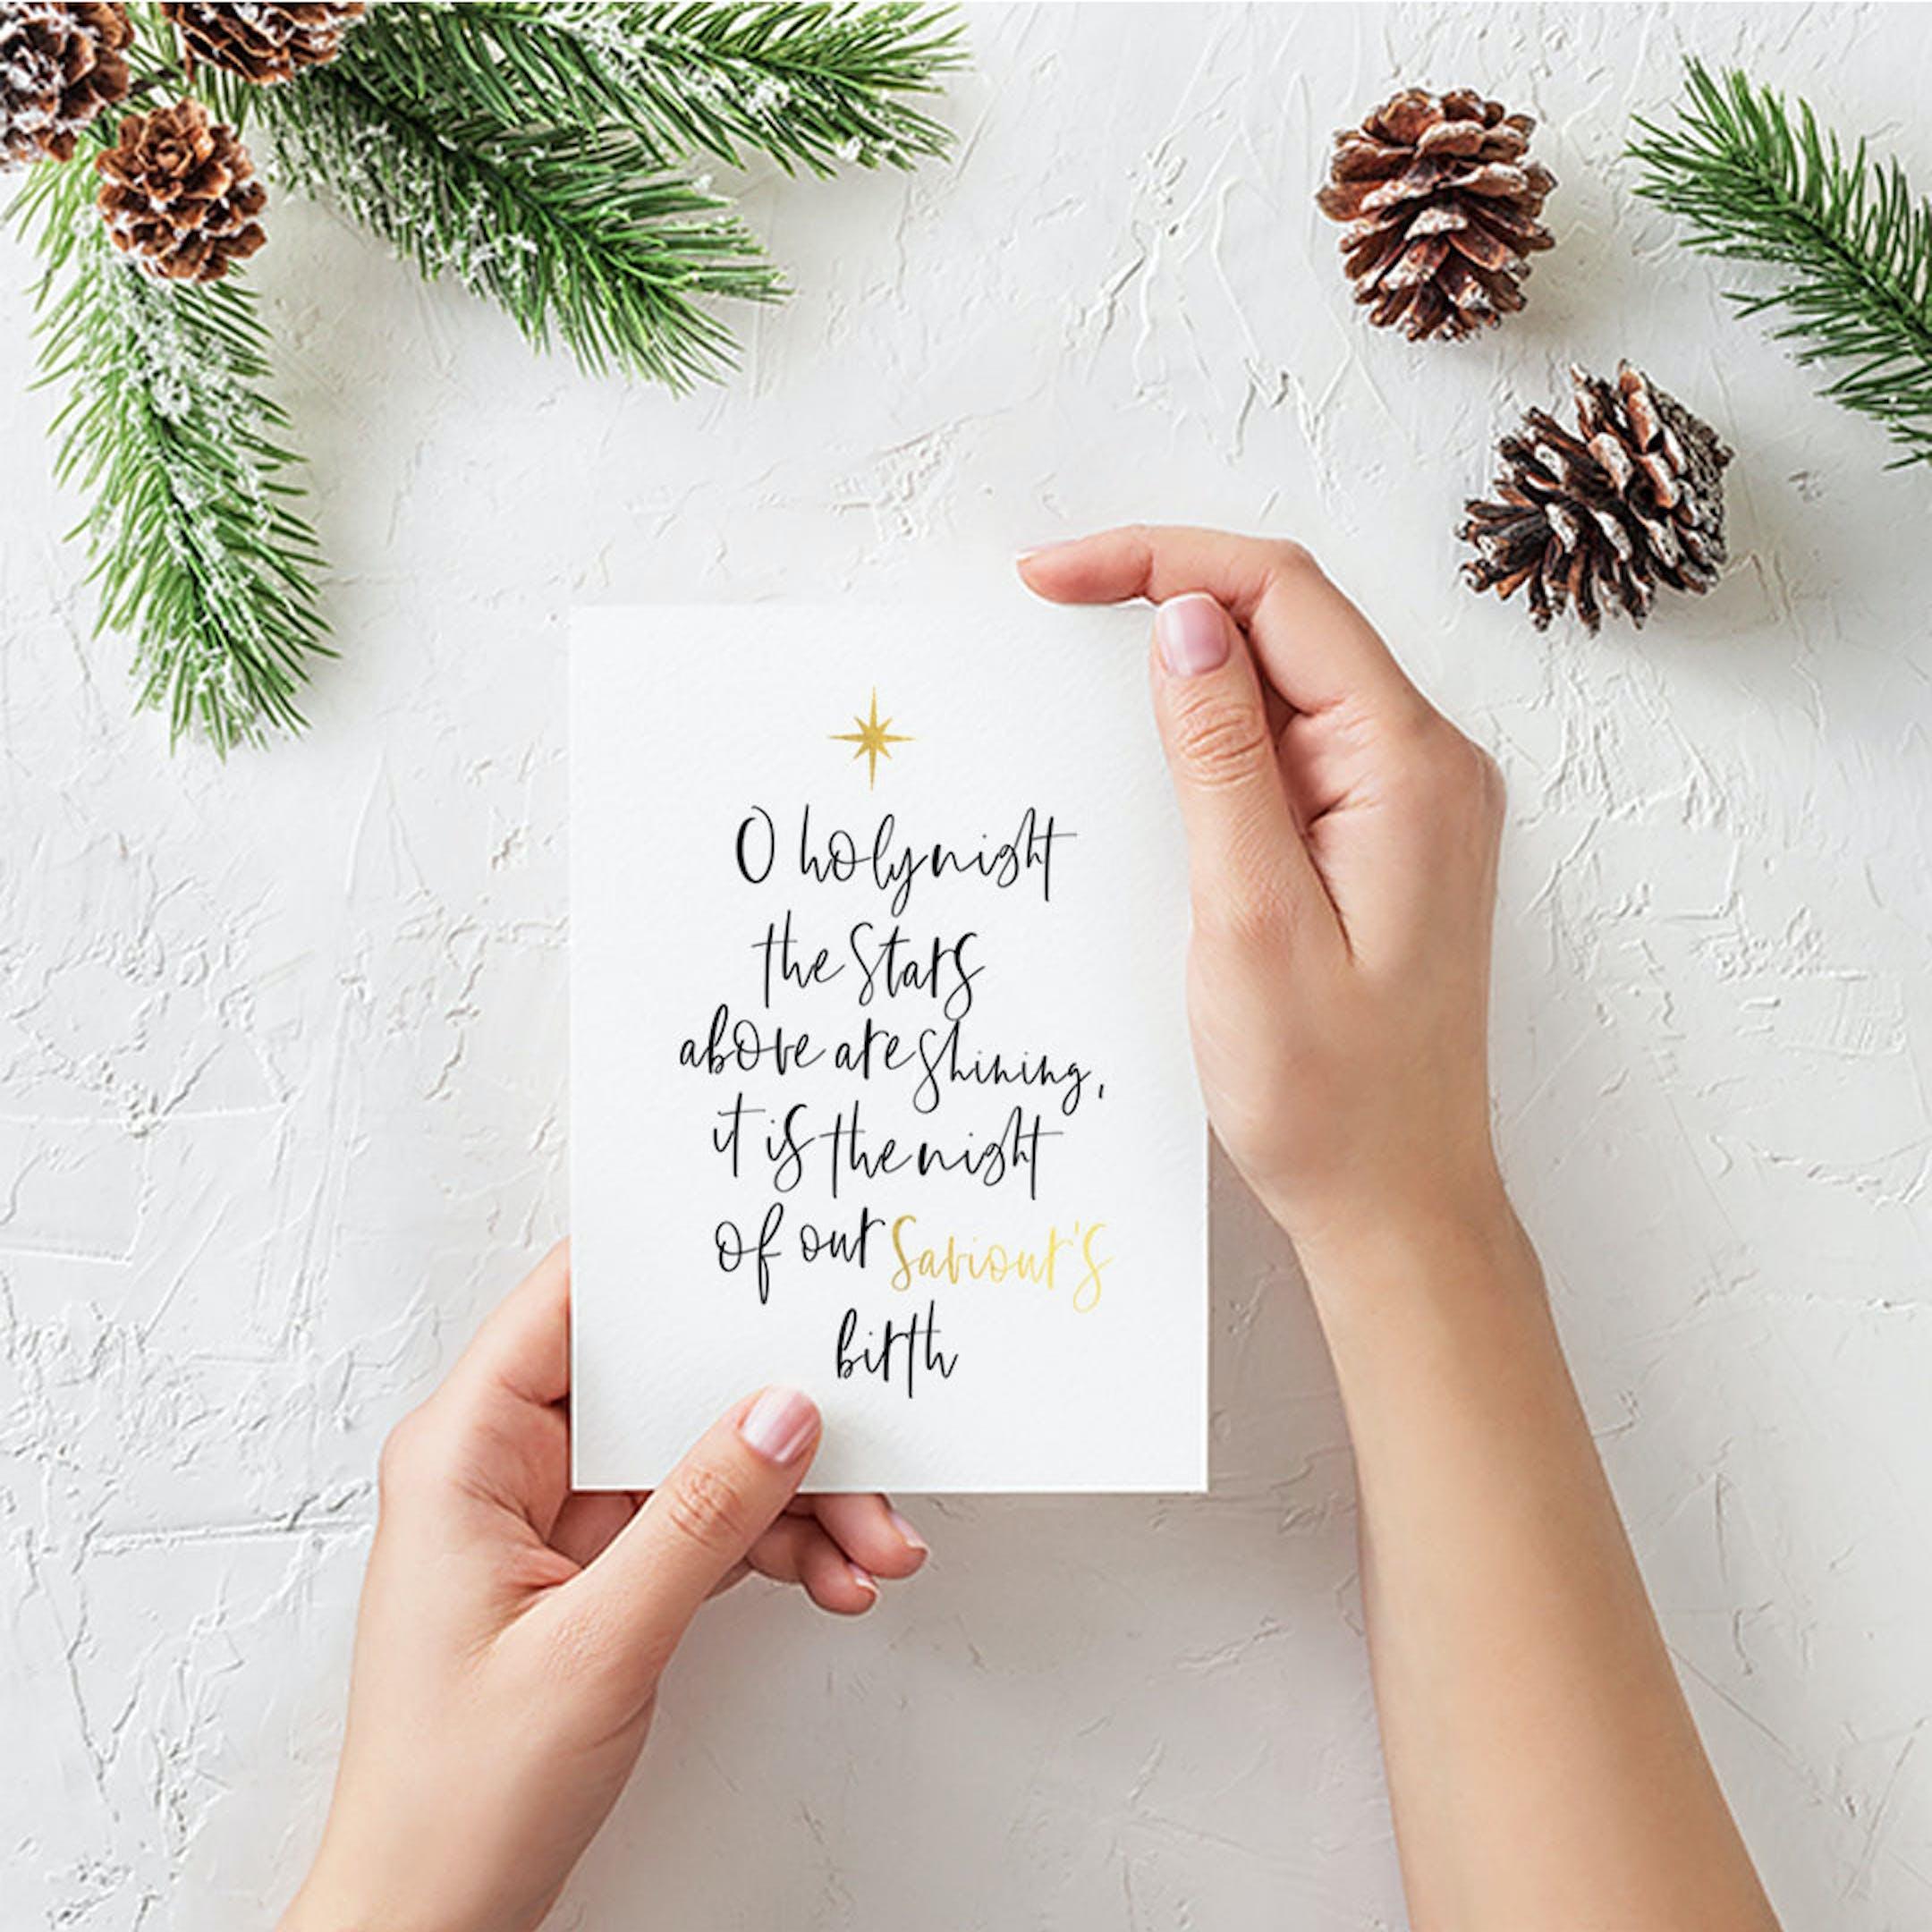 O Holy Night - Carols at Christmas Gold Card - Christian Lettering Company